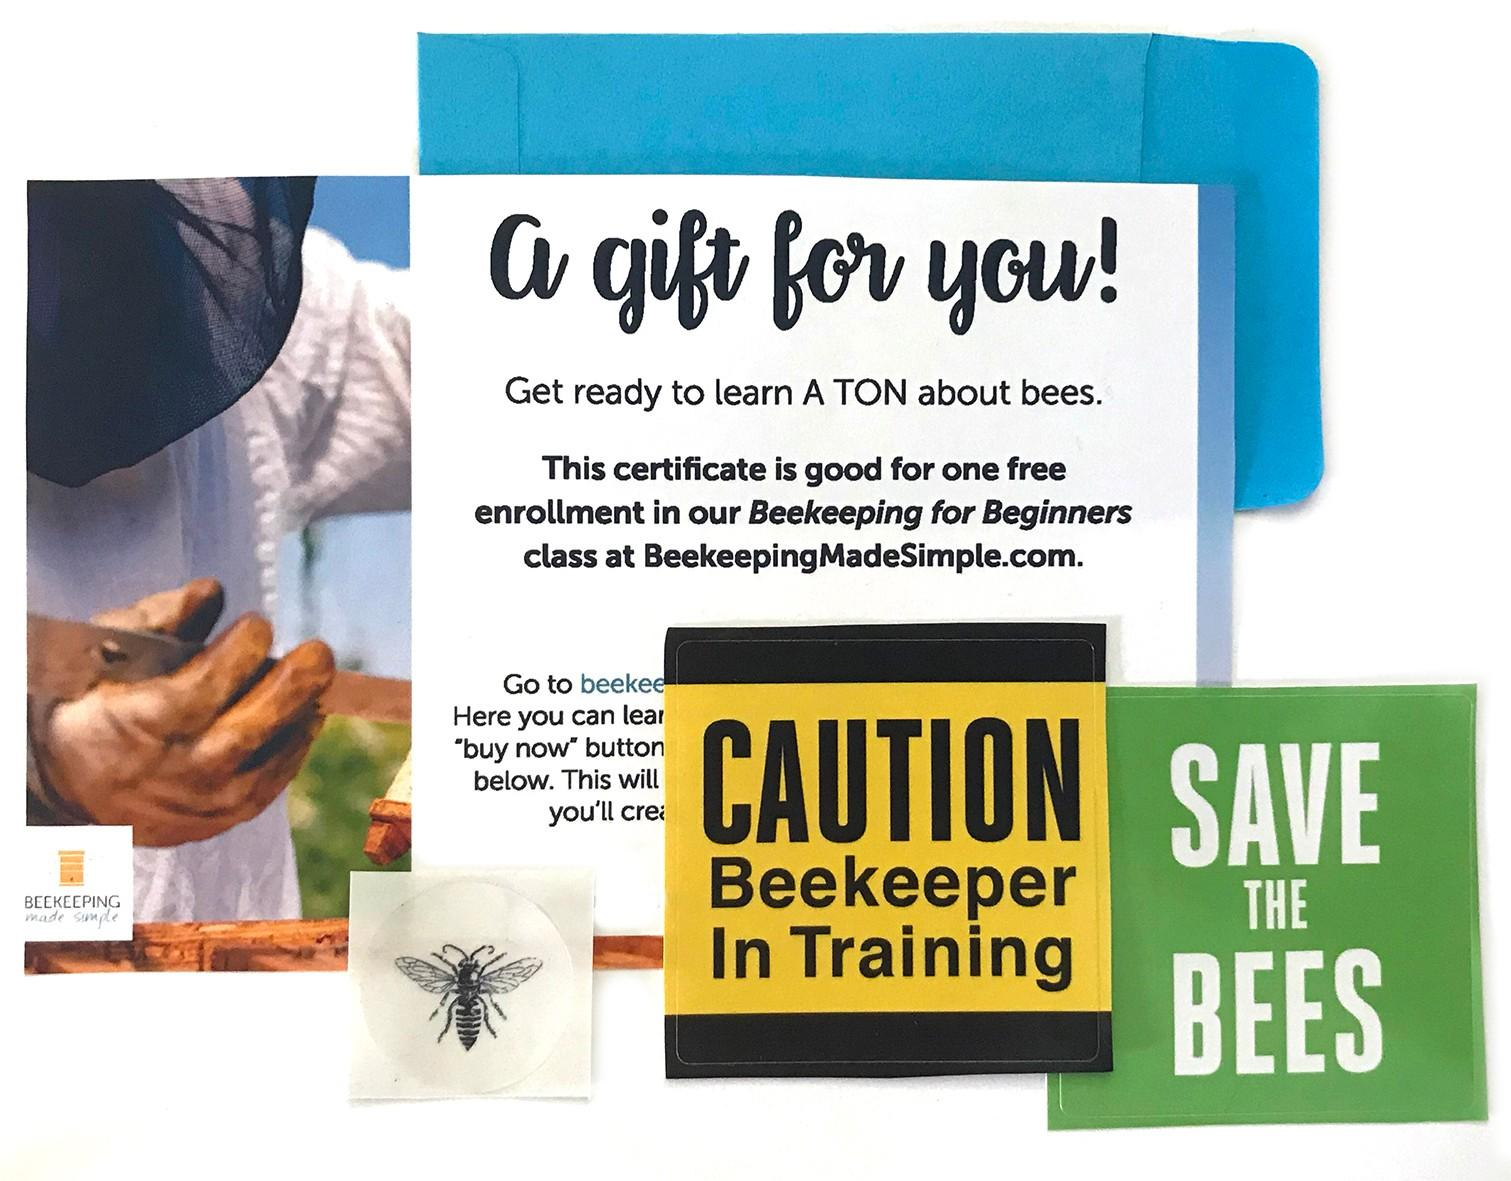 photo of online beekeeping class gift certificate